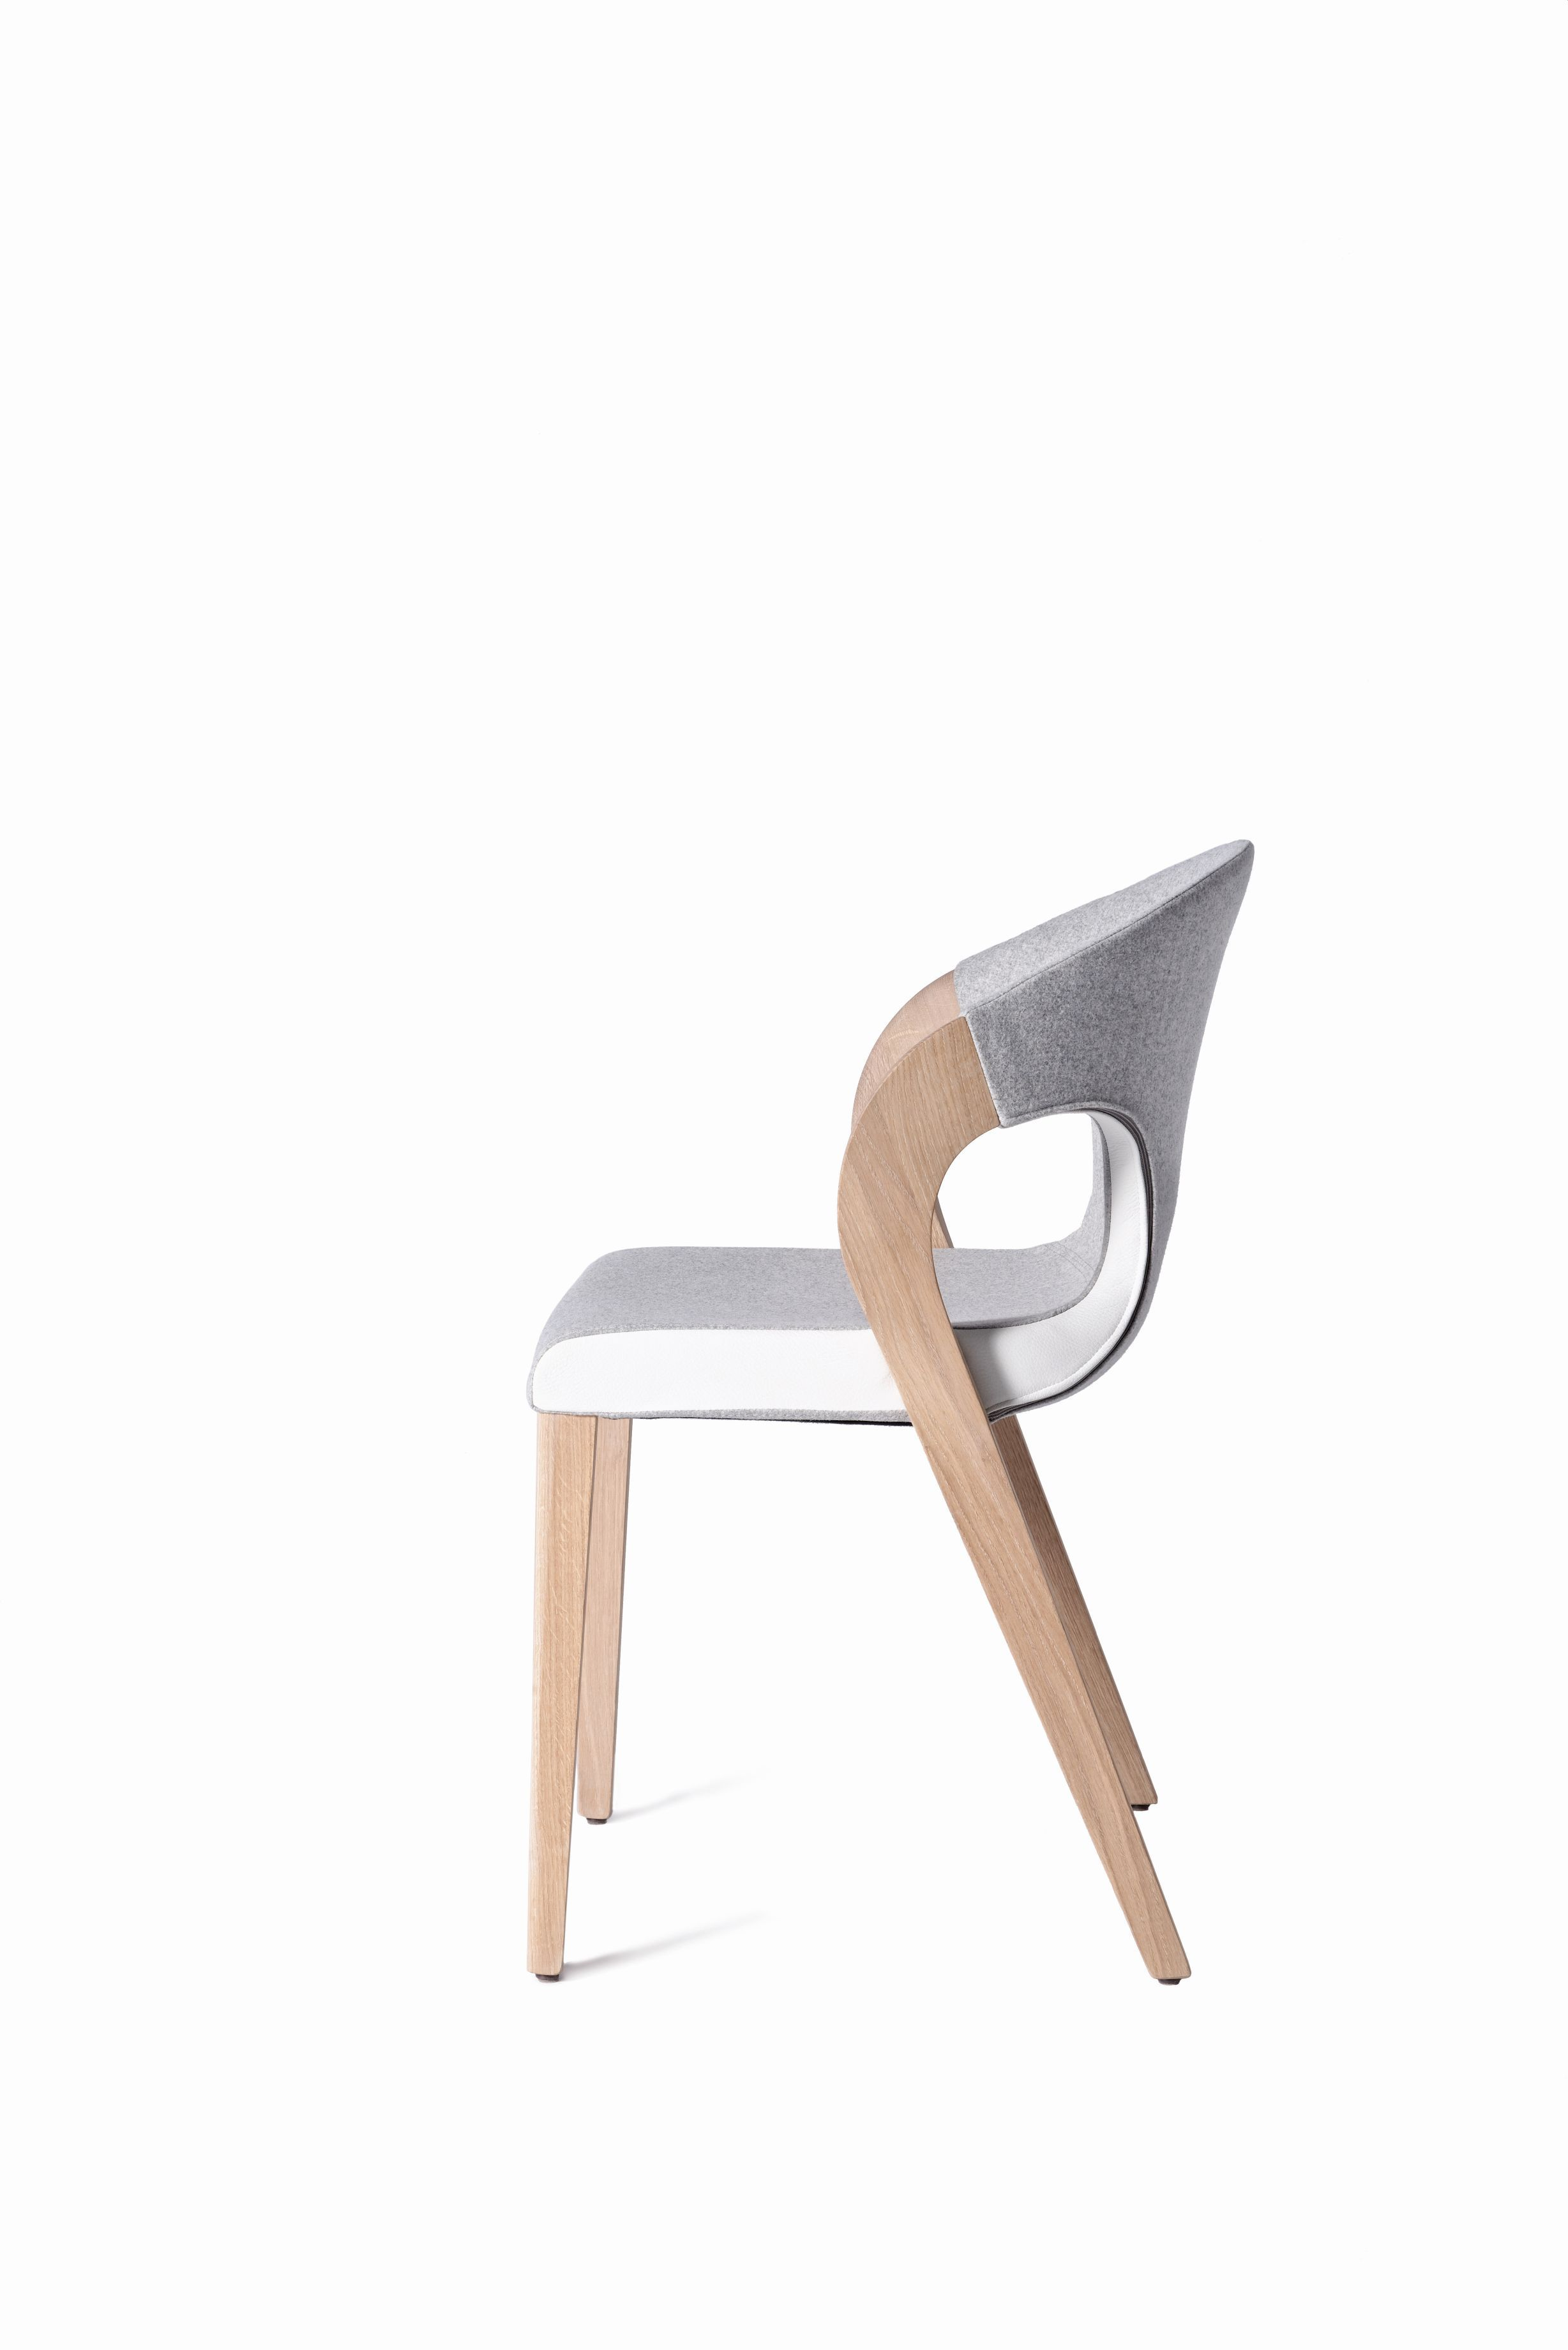 Voglauer V Organo Tisch Stuhl Design Kiste De Stuhle Voglauer Stuhl Design